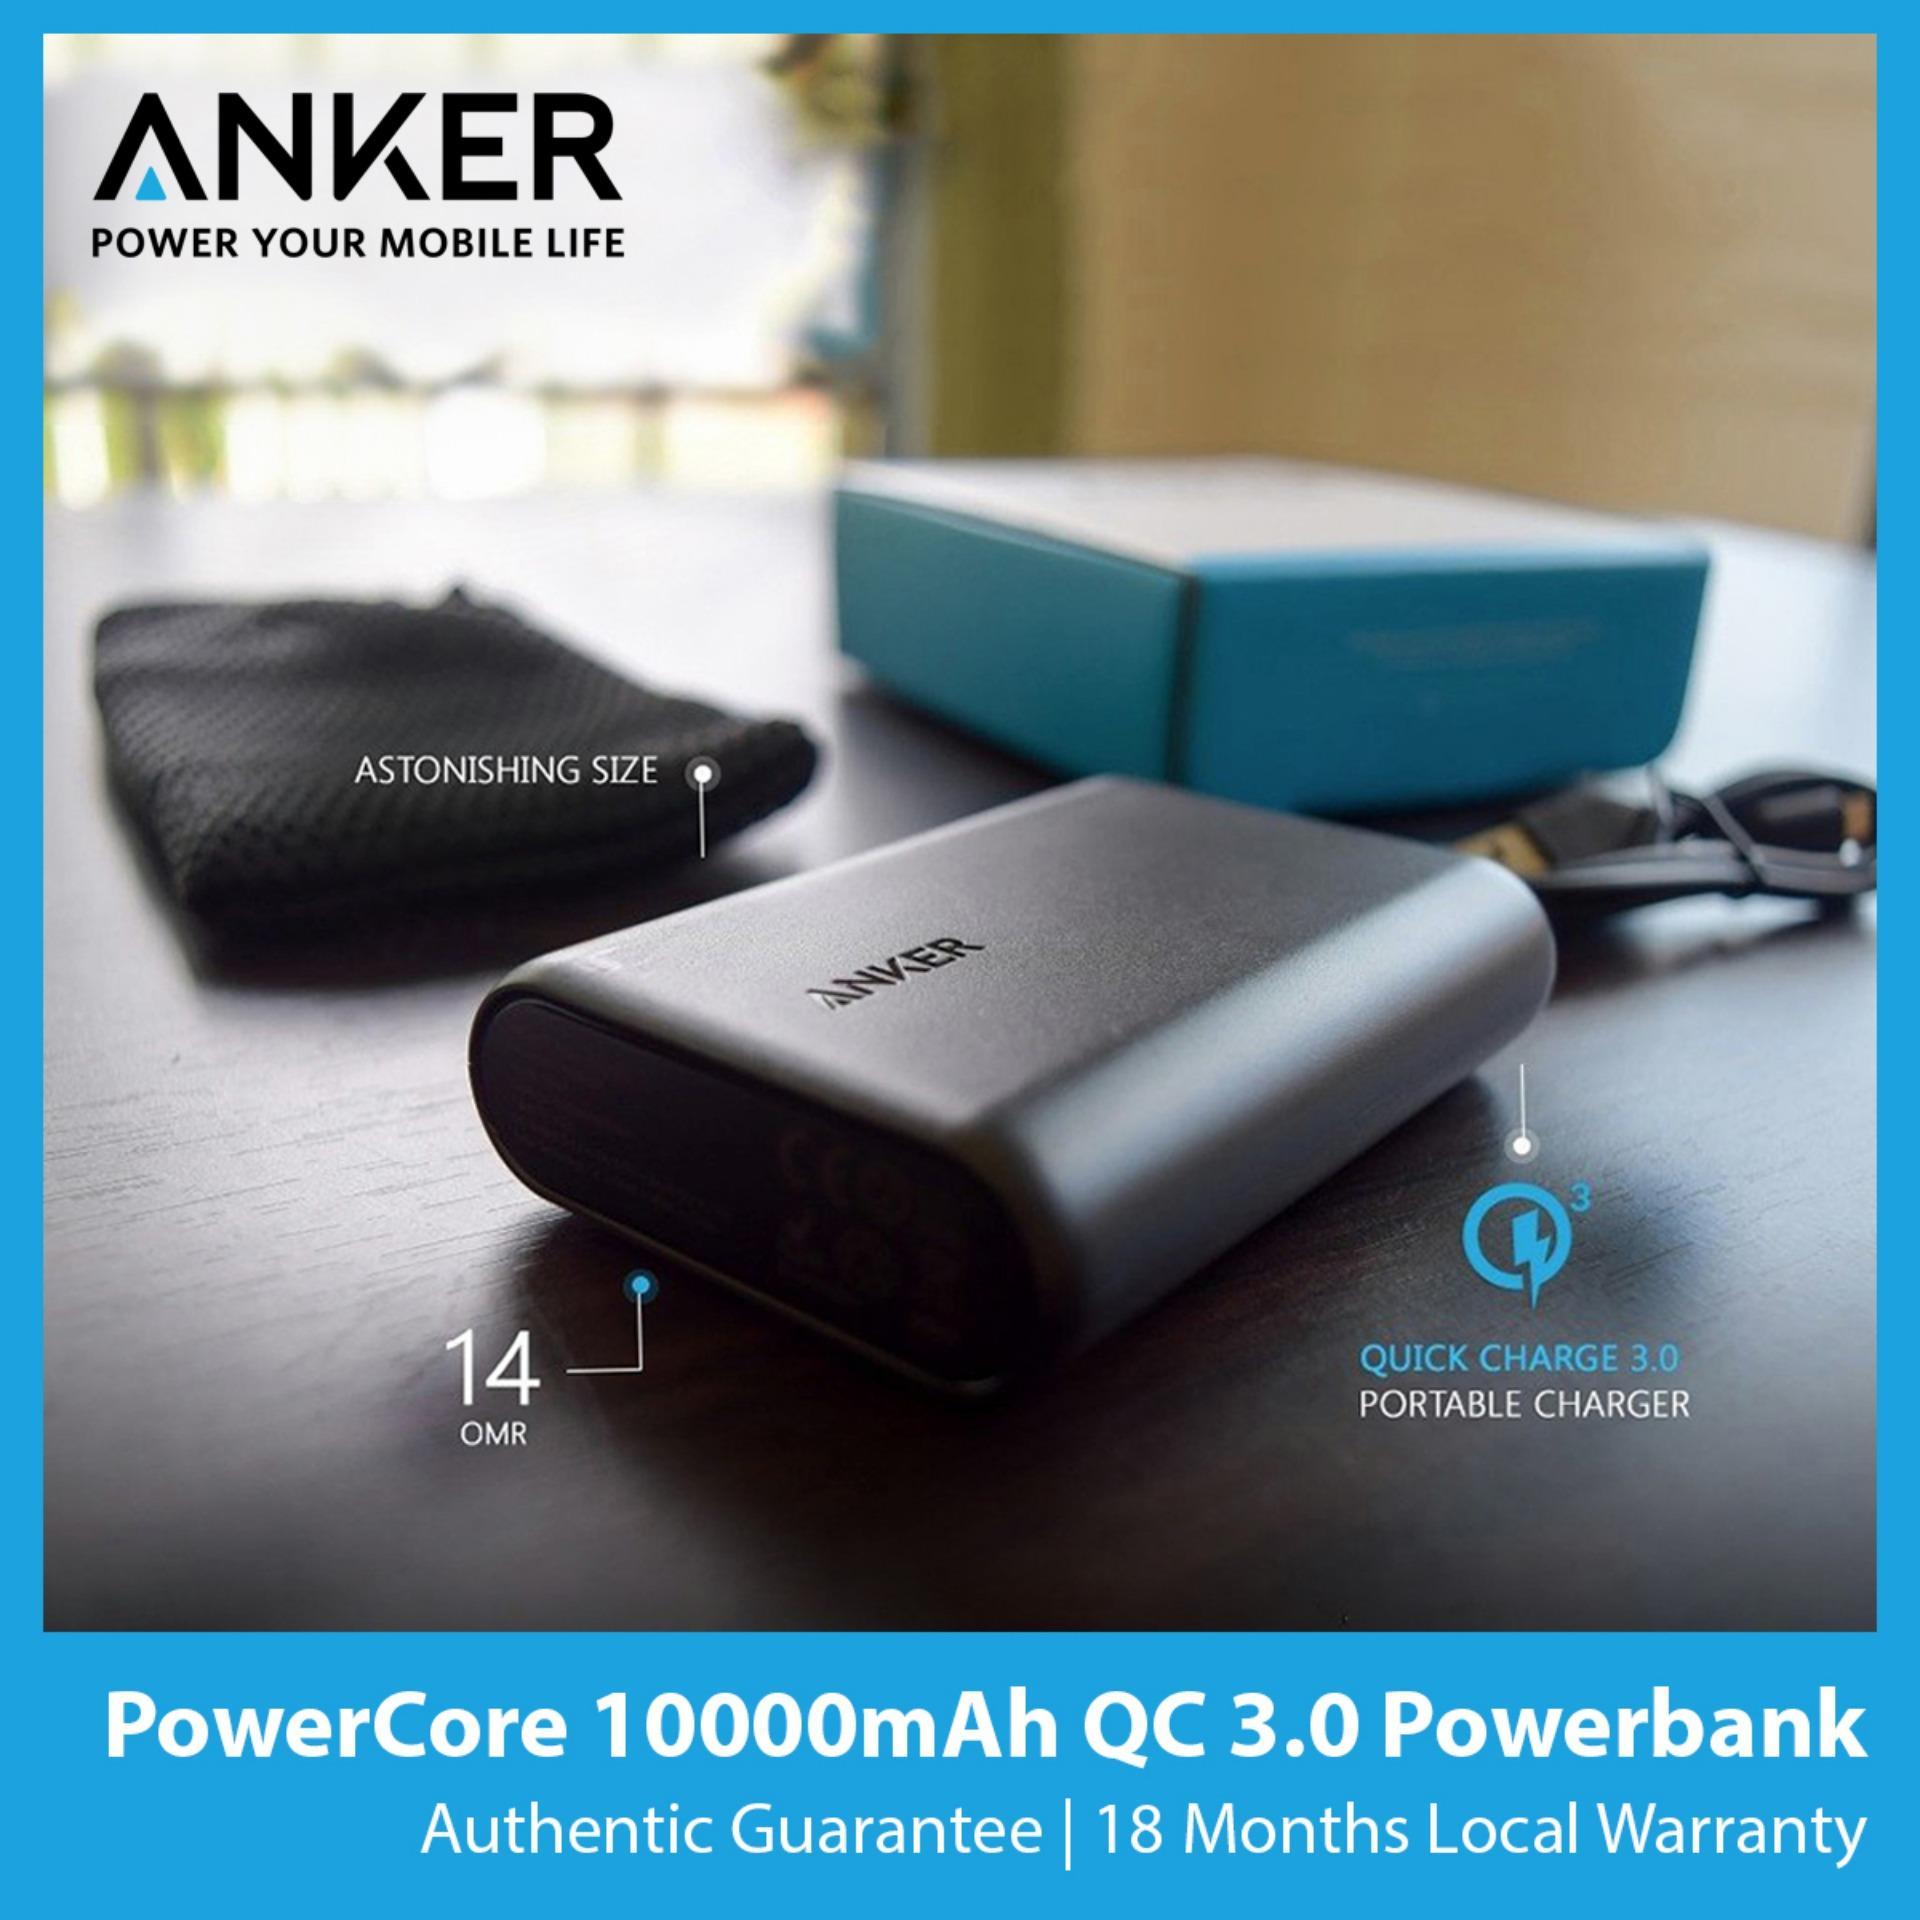 Anker PowerCore Speed 10000mAh QC 3.0 Portable Powerbank